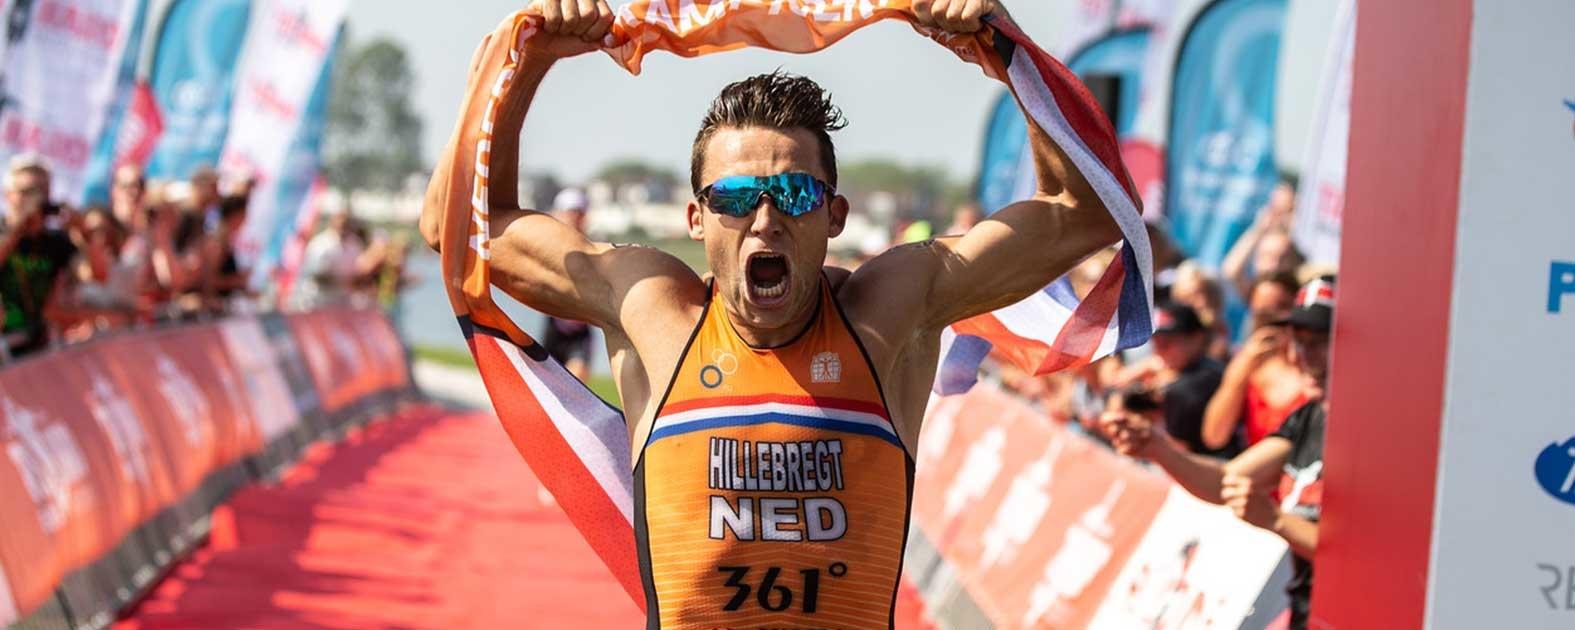 Hillebregt Nederlands kampioen